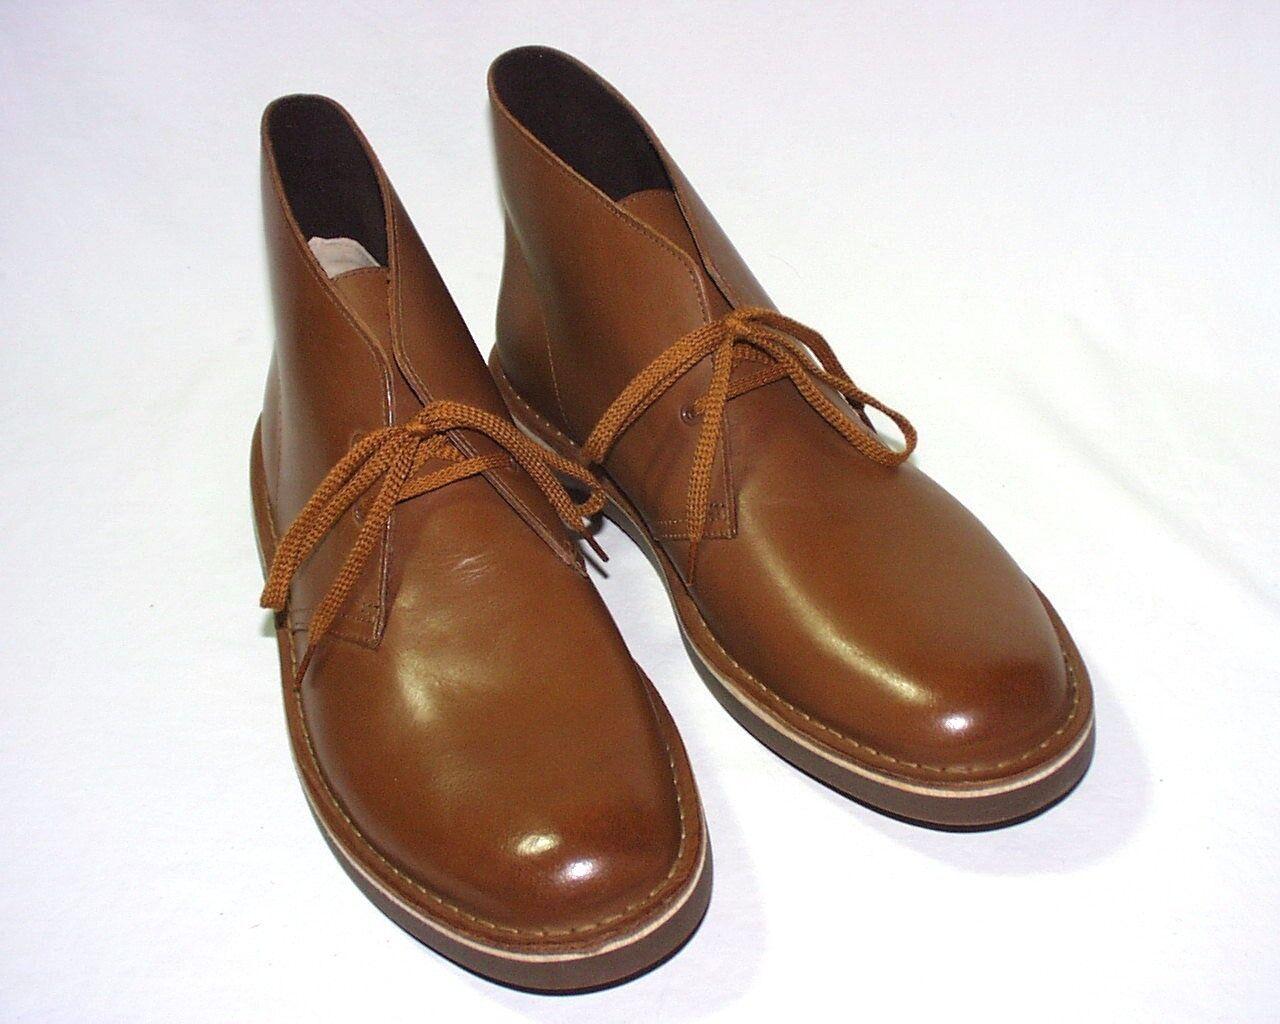 Clarks Bushacre 2 Desert Boots, Leather Upper, Tan or Gray, New